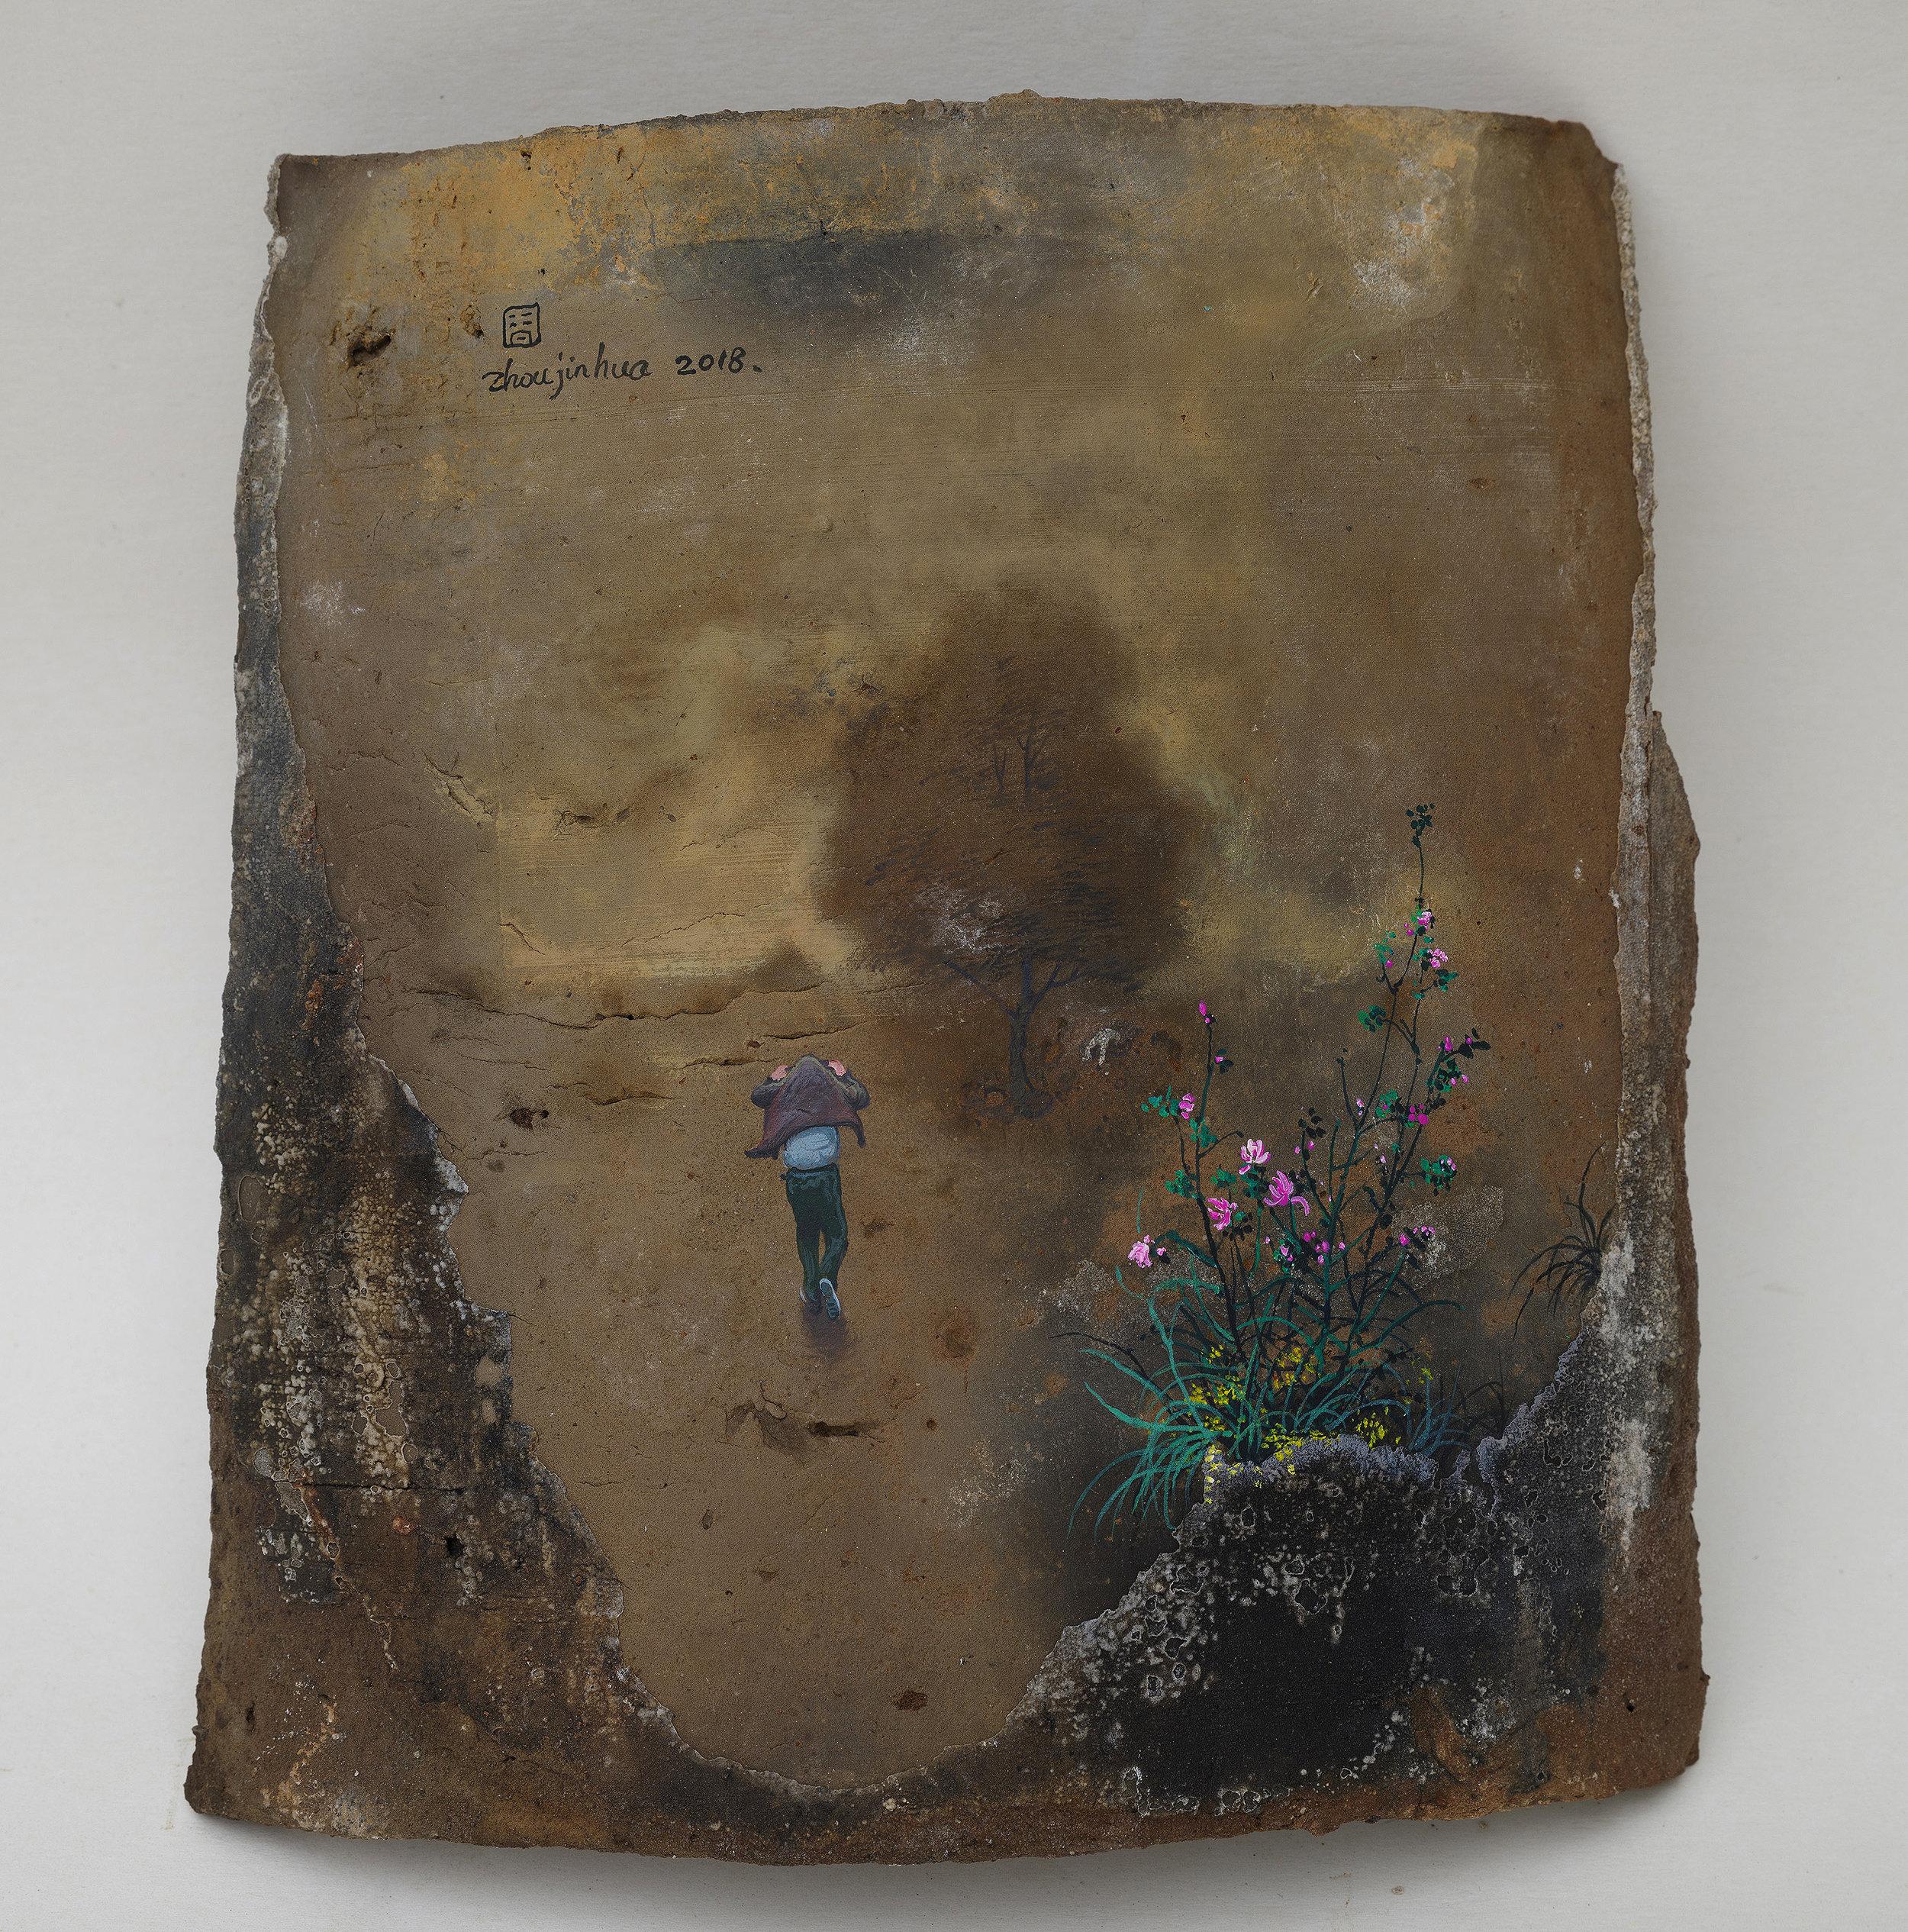 Zhou Jinhua 周金华, Remains of the Day 你我的痕迹 No.2, 2018, Acrylic on roof tile 瓦片、丙烯颜料, 21.2 x 19.5 cm